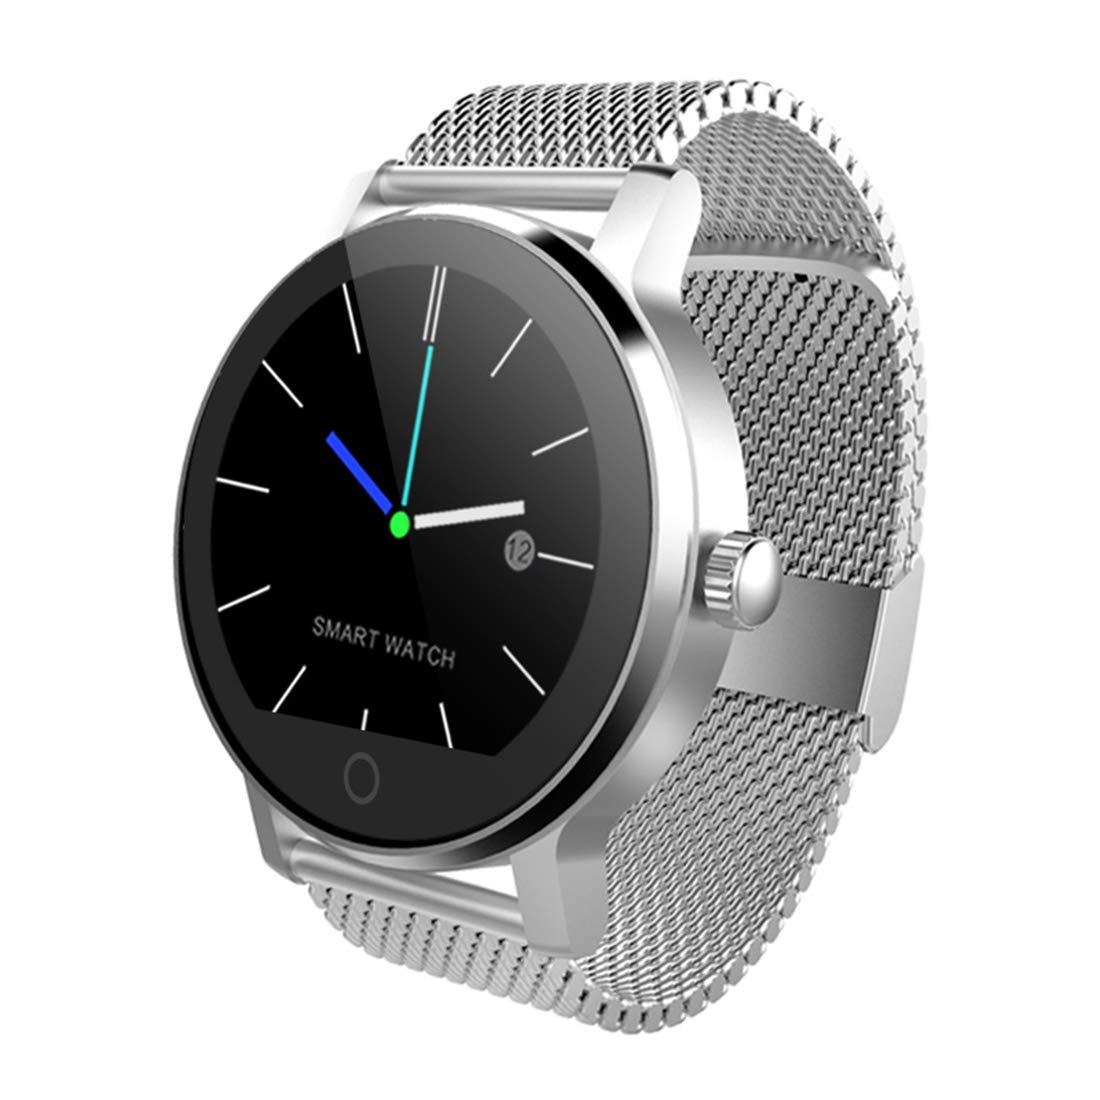 Smartbox SMA 09 Bluetooth Llamada Telefónica Reloj Inteligente con ...